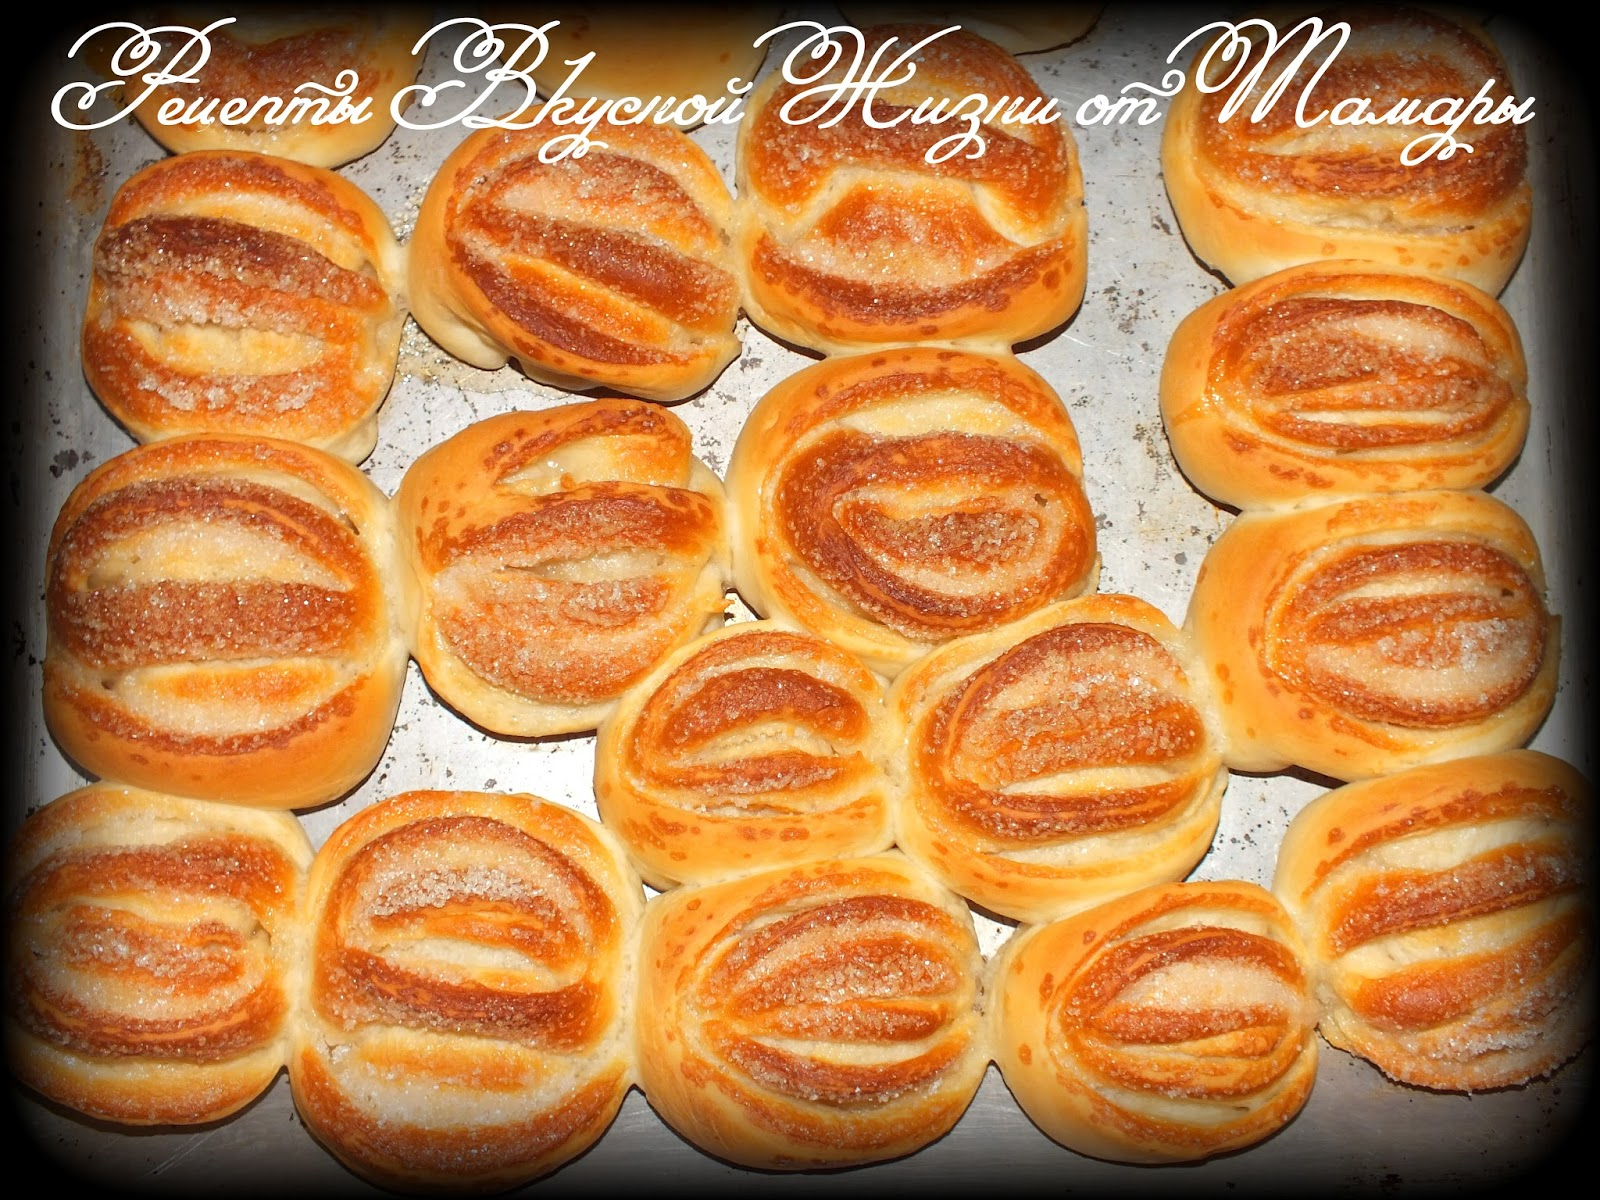 Фото как красиво сделать булочки с сахаром